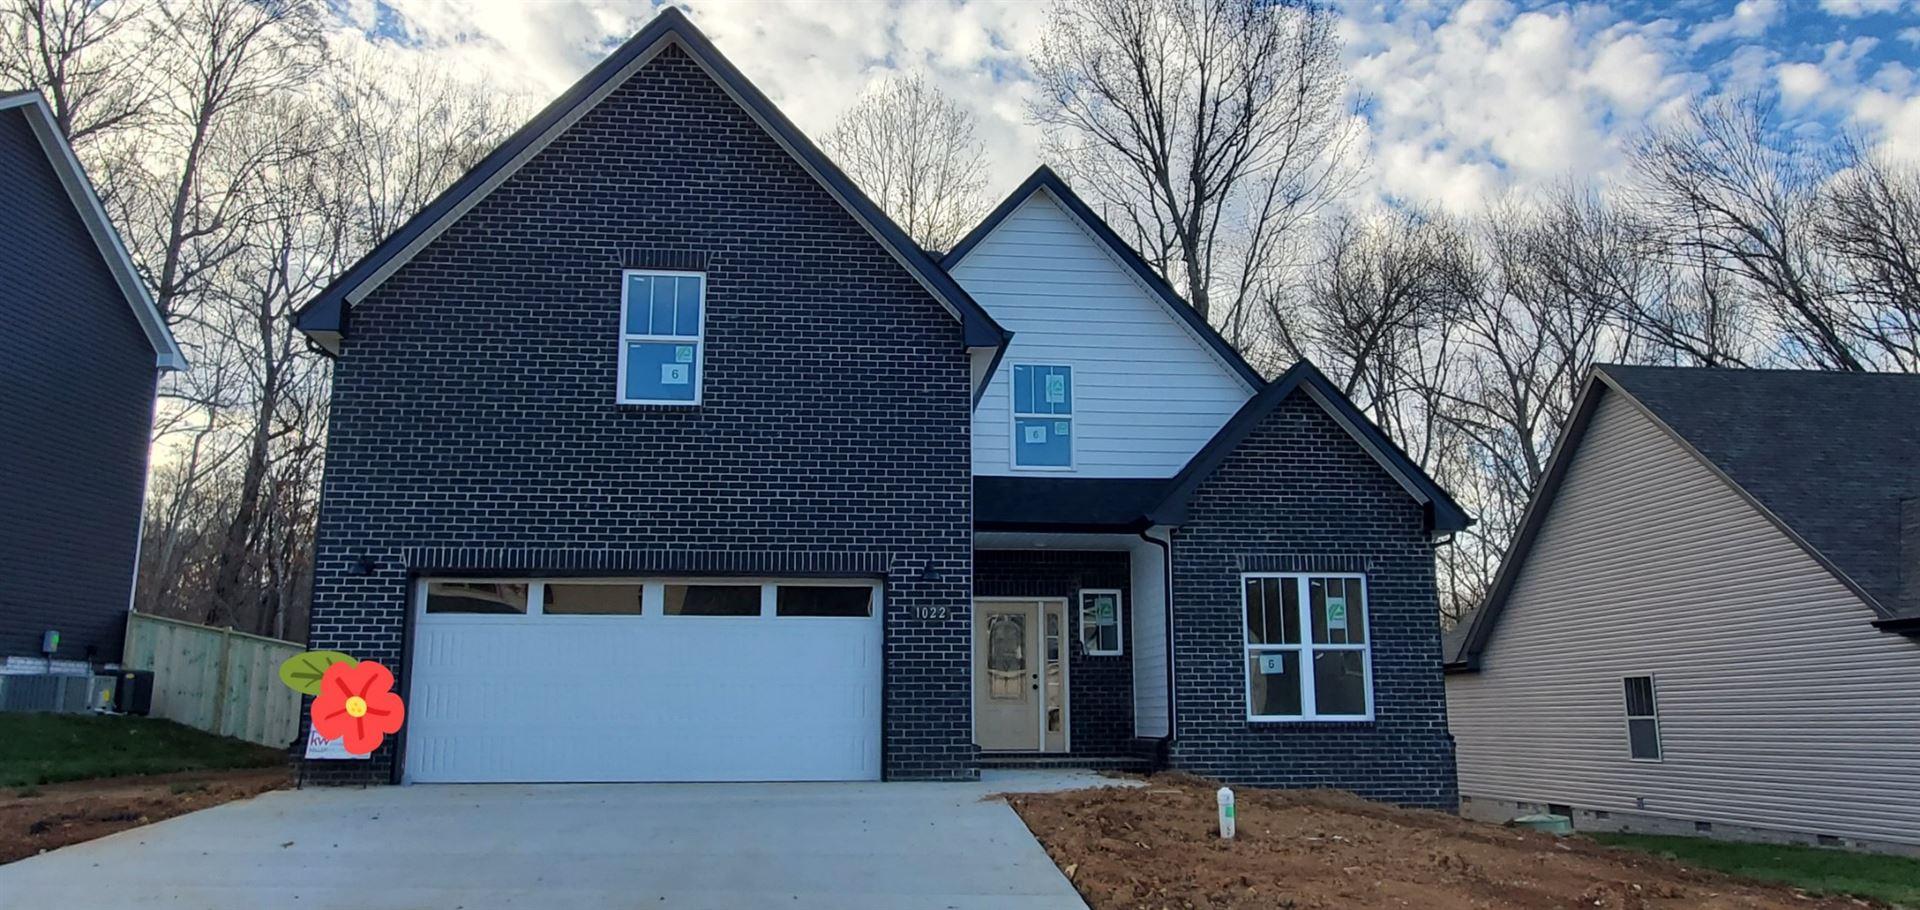 6 Glenstone Village, Clarksville, TN 37043 - MLS#: 2256763